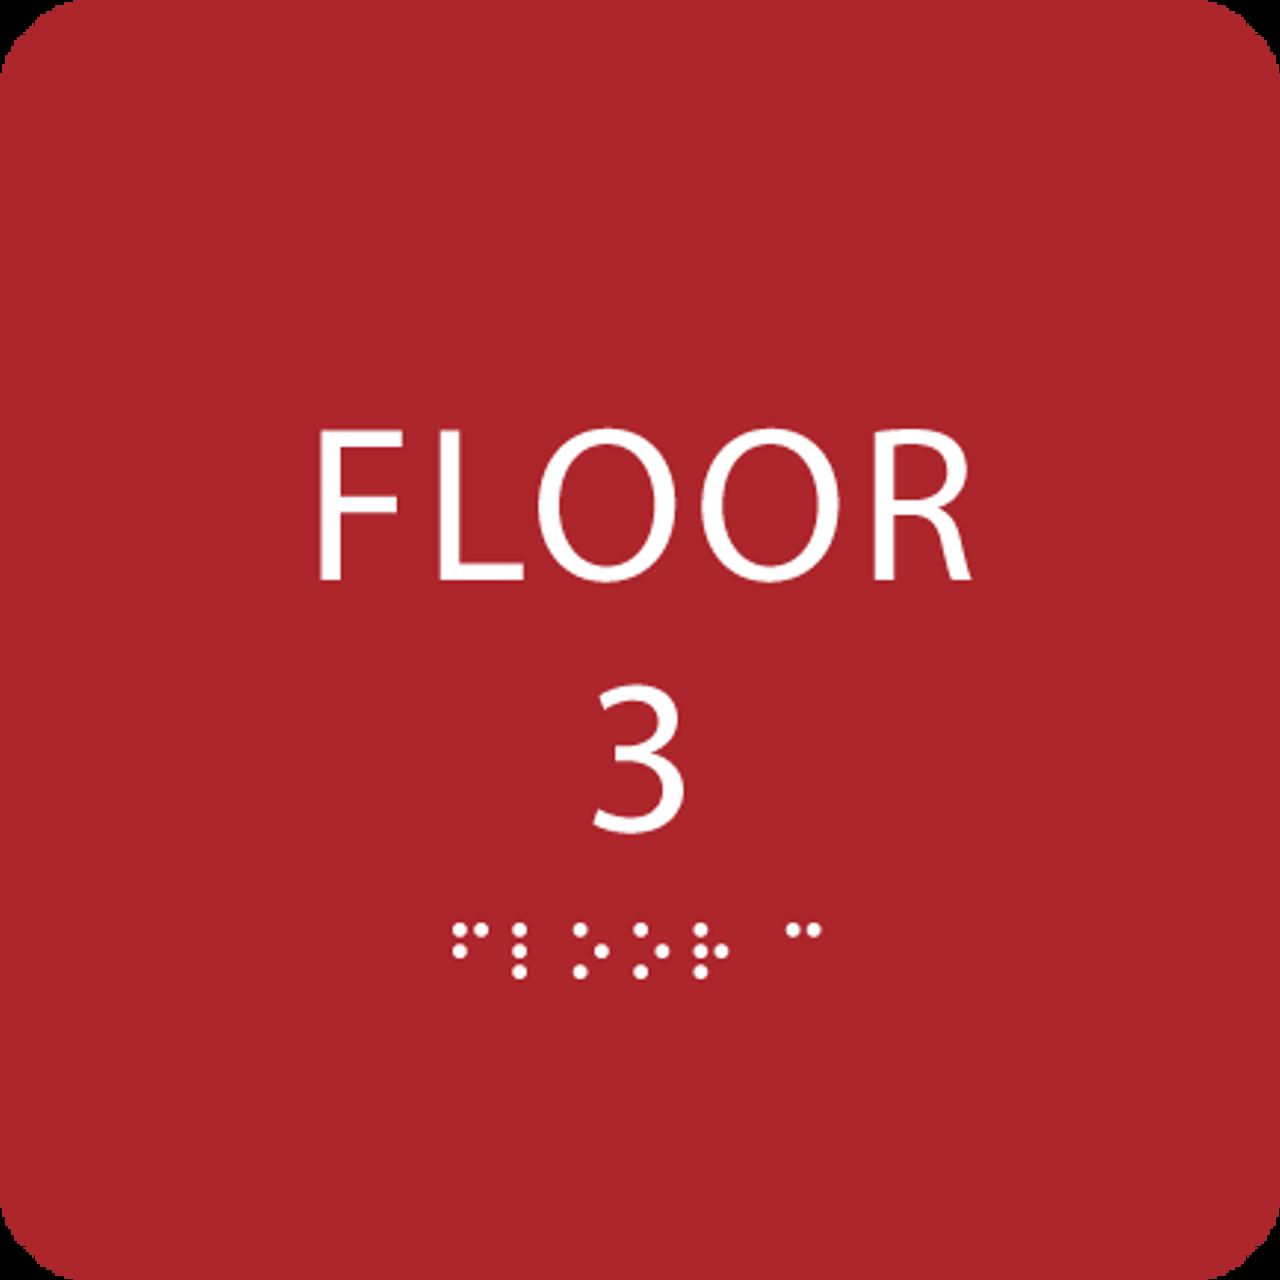 Red Floor 3 Identification Sign